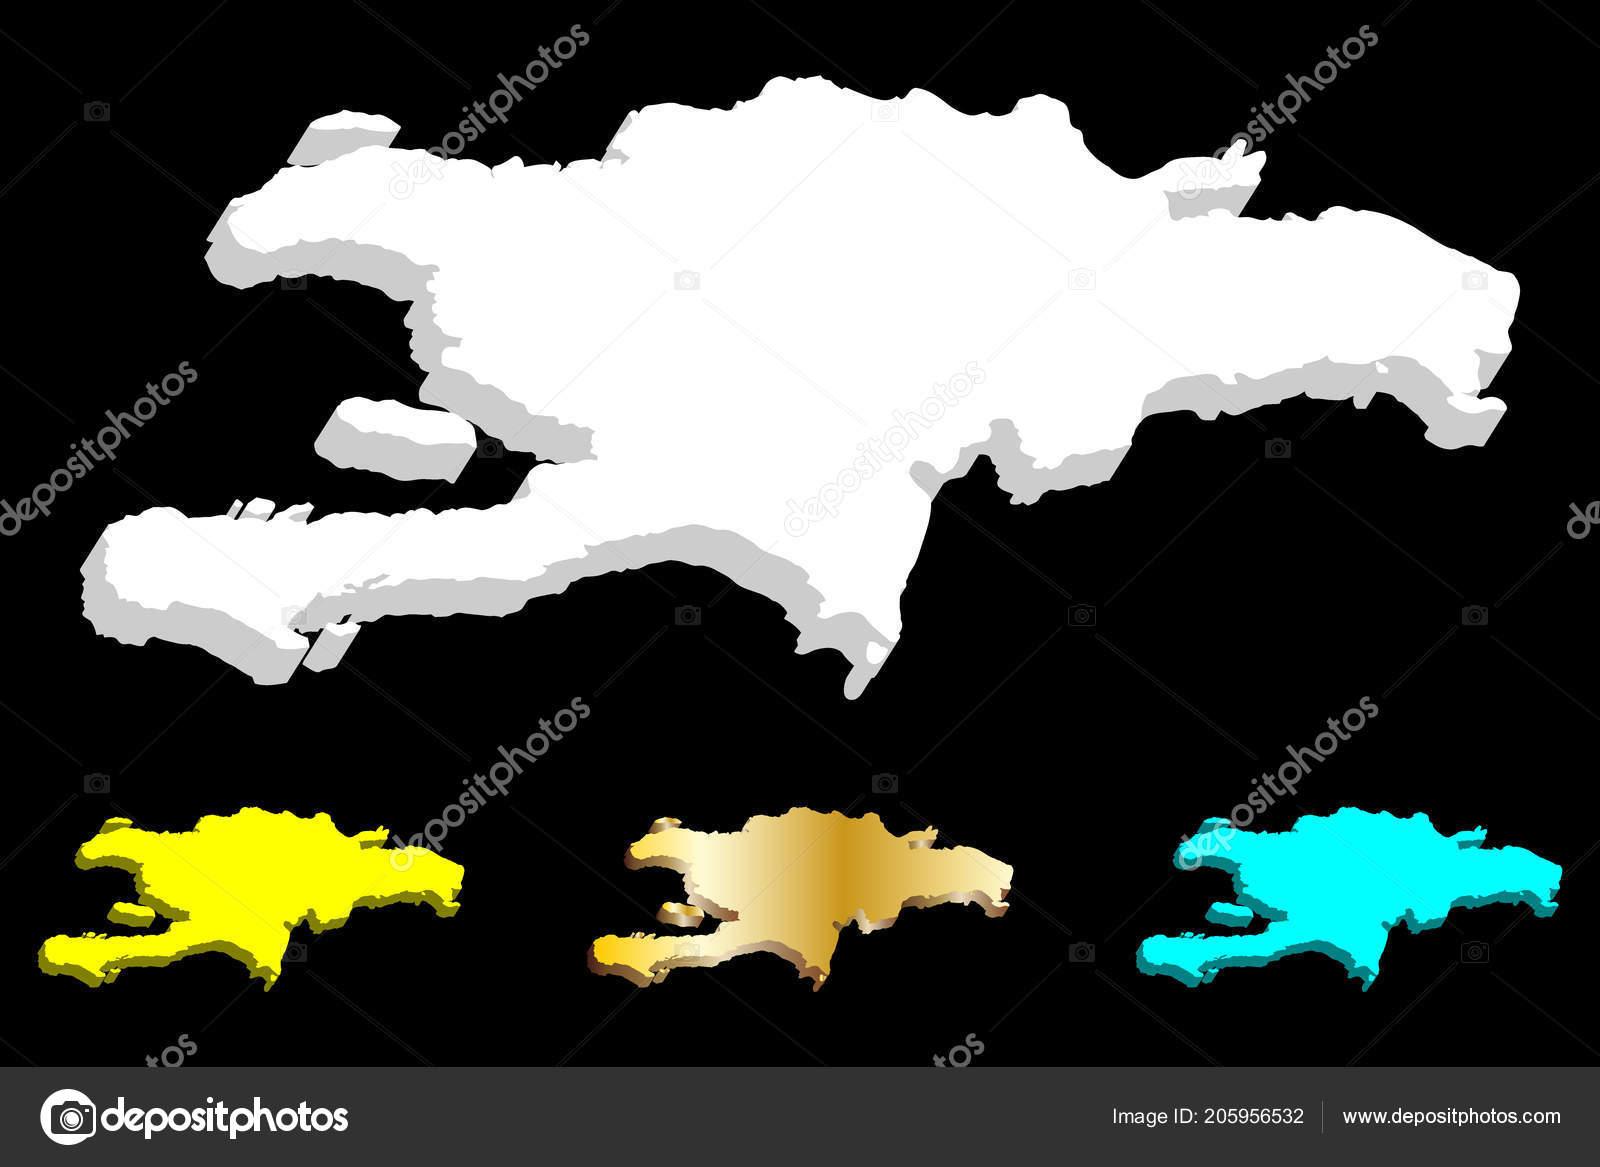 Map Hispaniola Dominican Republic Haiti White Yellow Blue Gold